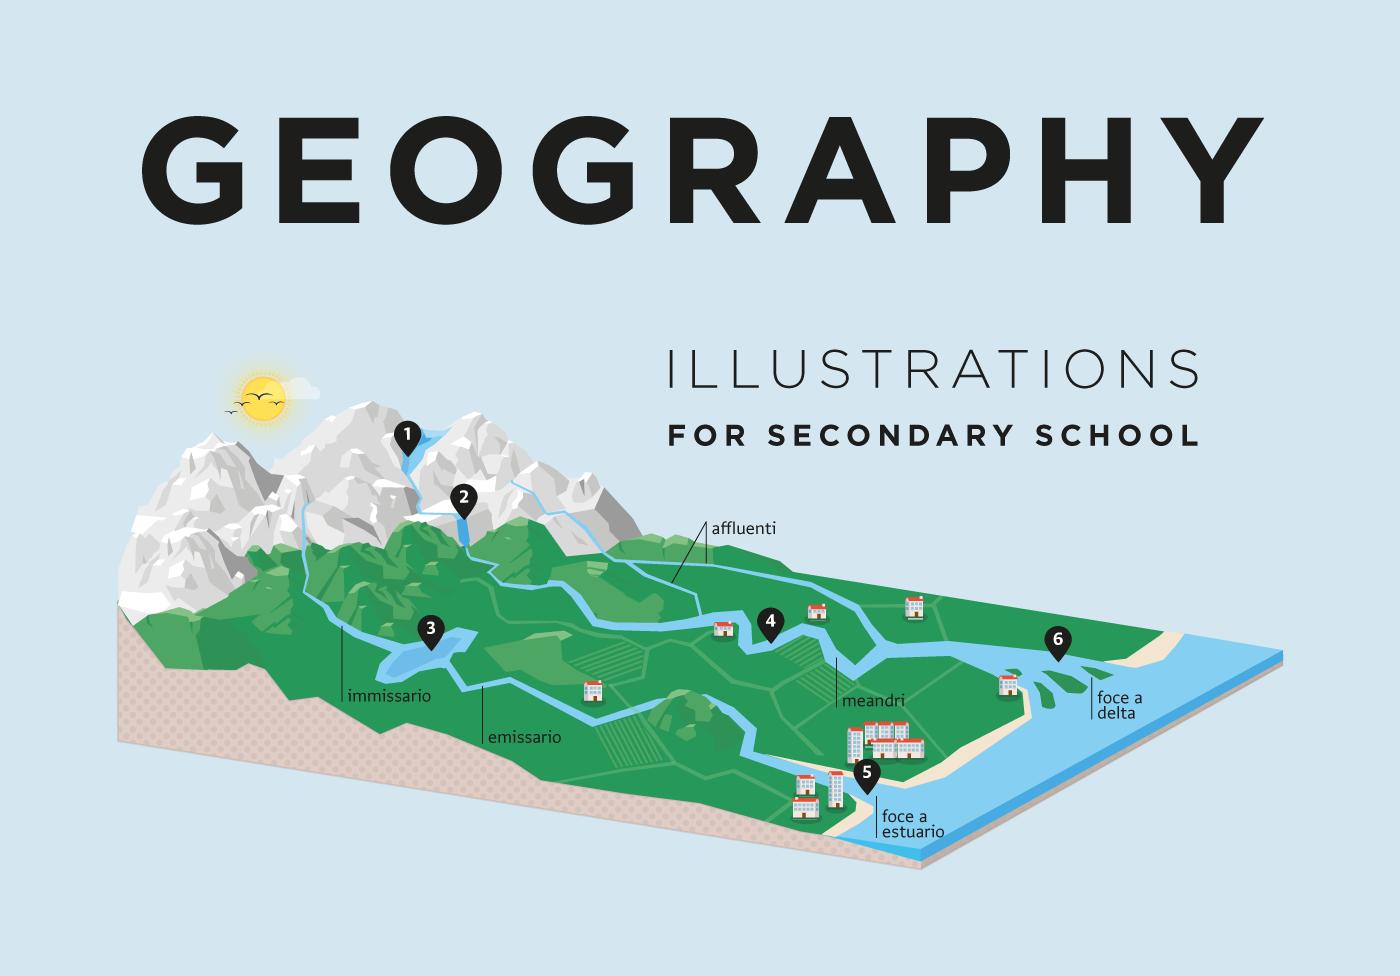 Geography - Loescher on Behance